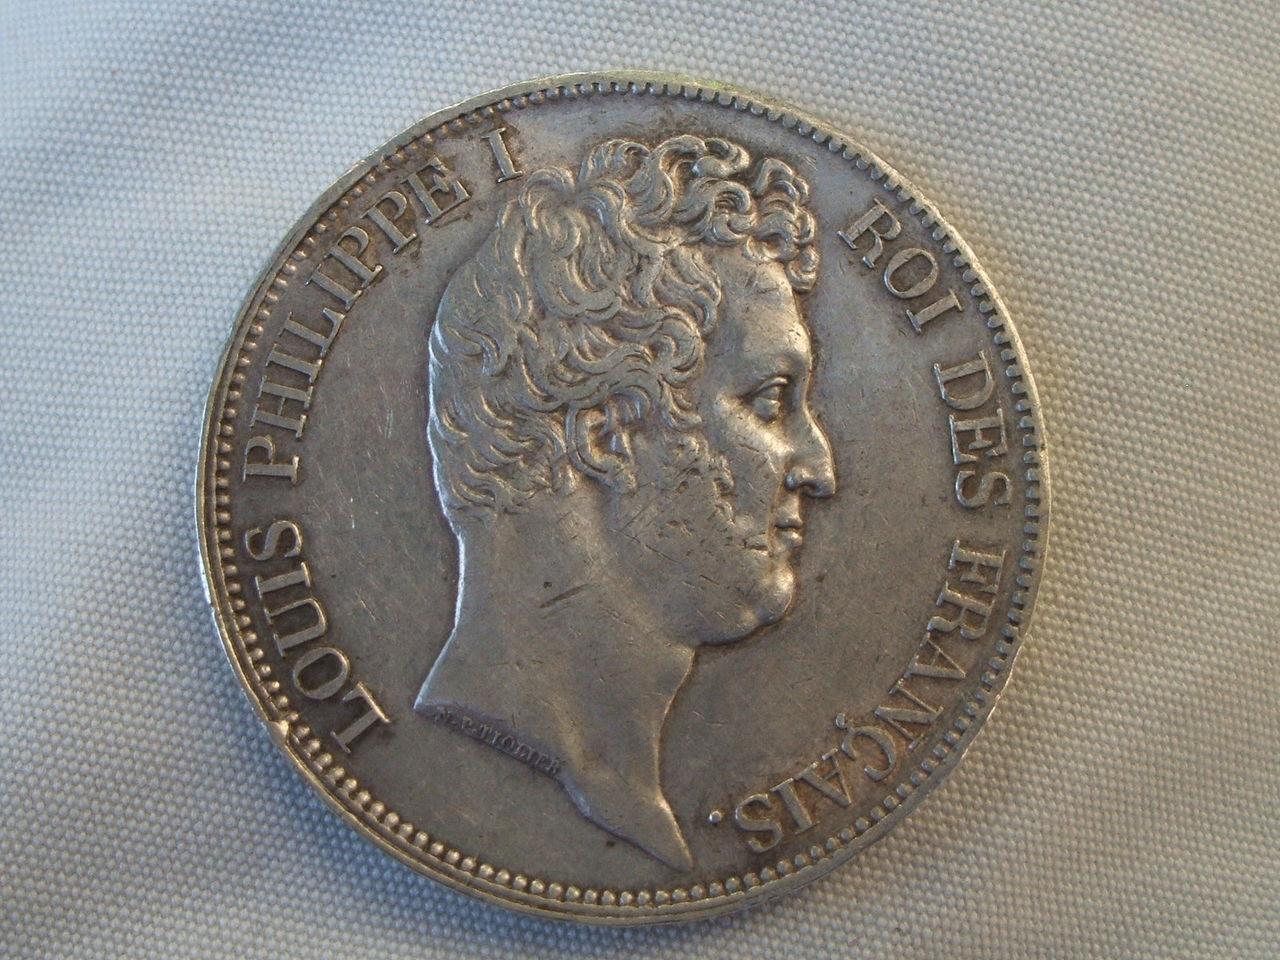 5 Francos de 1830 (Marsella). Luis Felipe I. Francia. Ssii